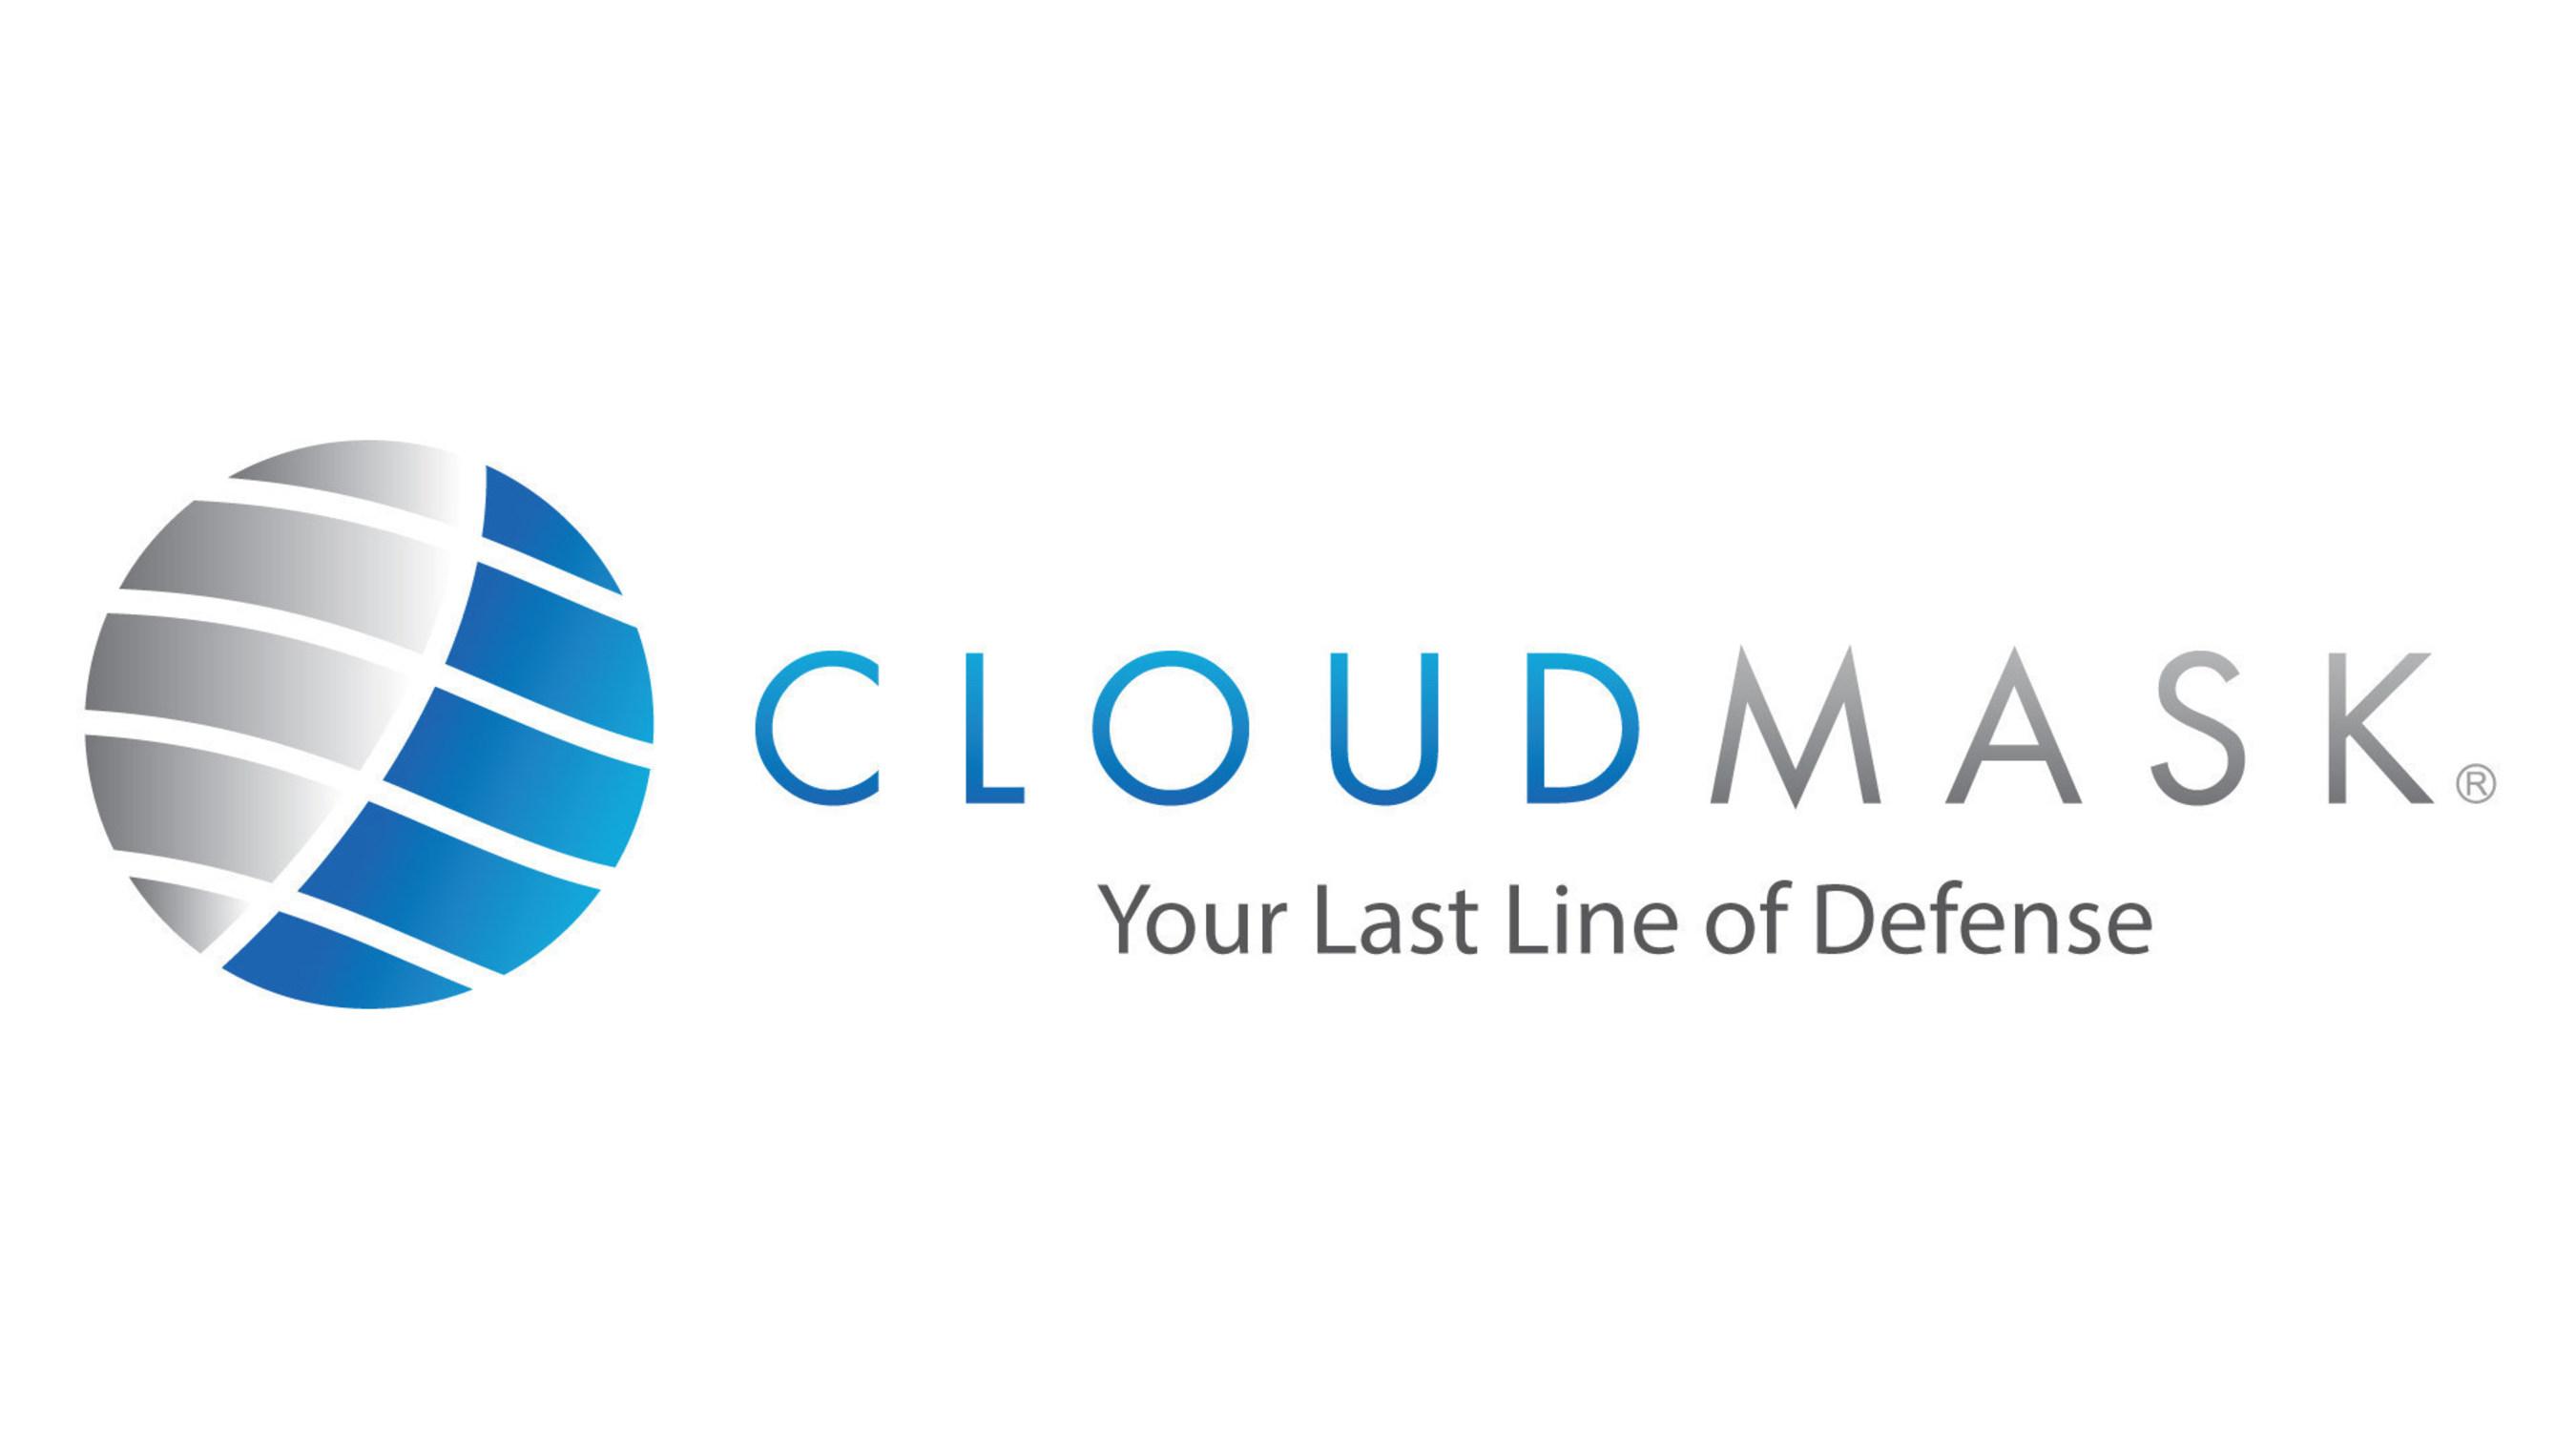 CloudMask, data protection under breach